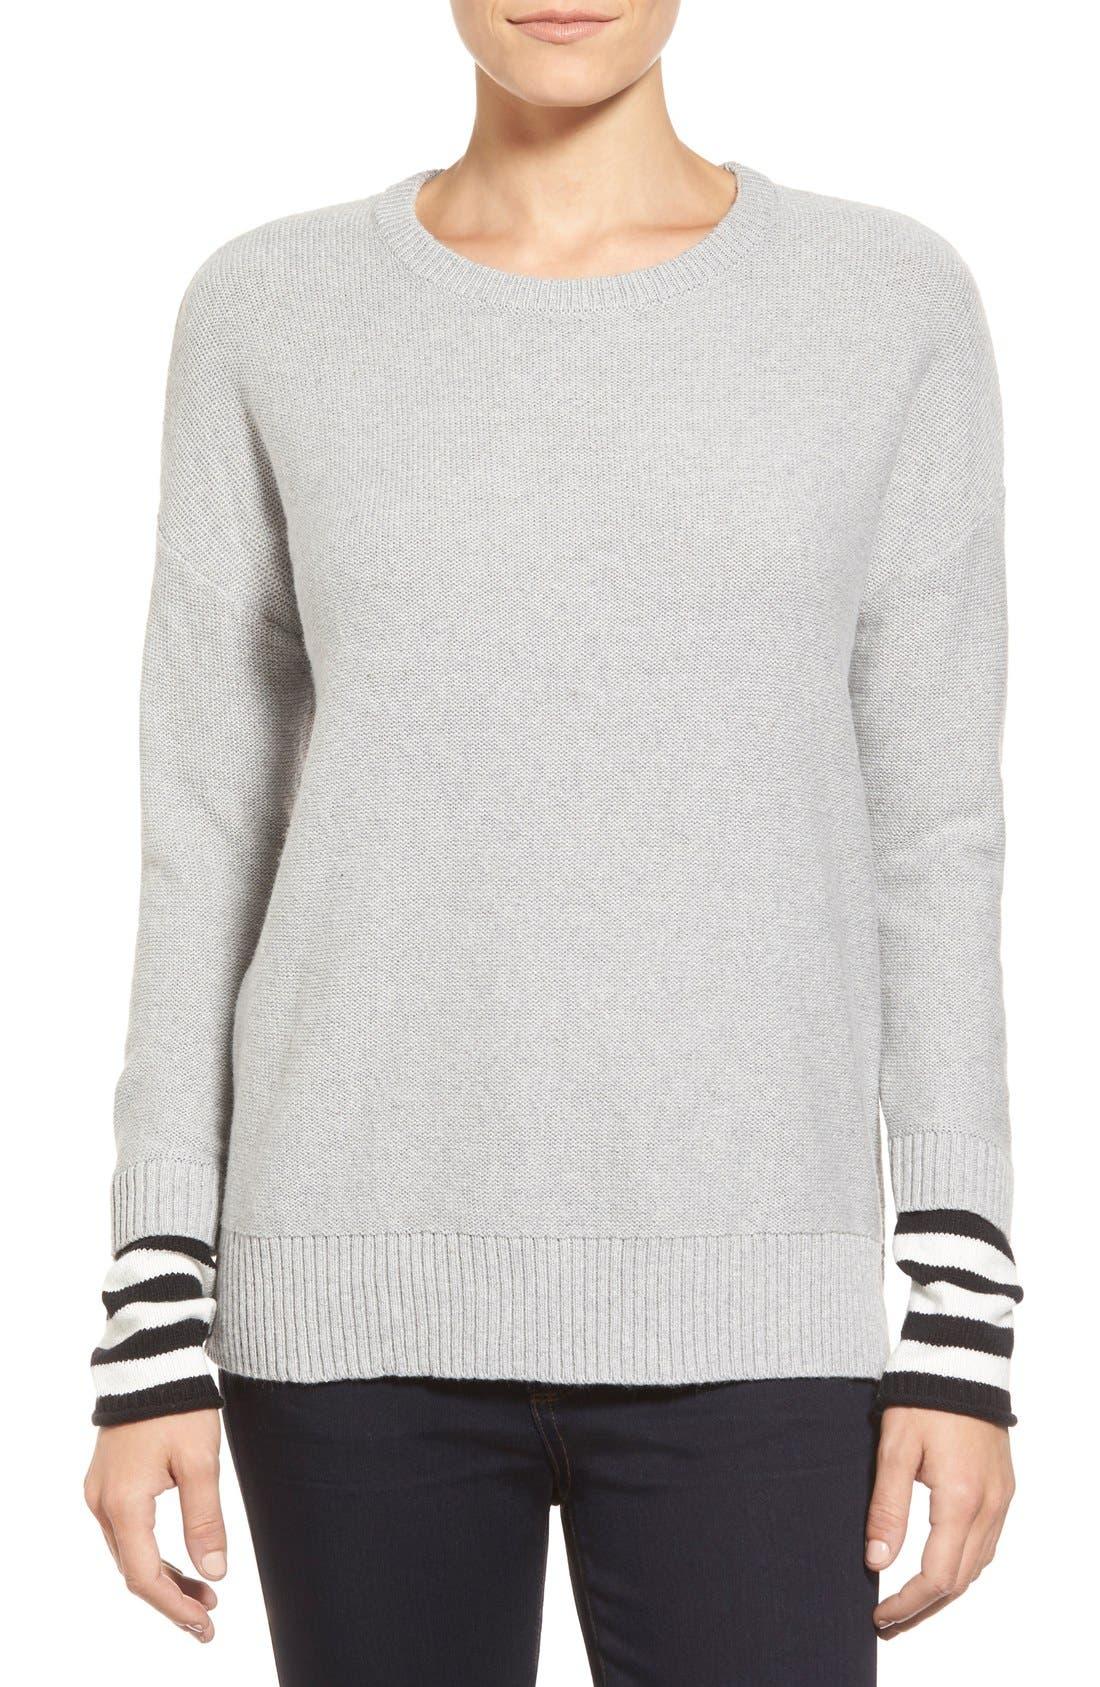 Contrast Cuff Crewneck Sweater,                             Main thumbnail 1, color,                             030